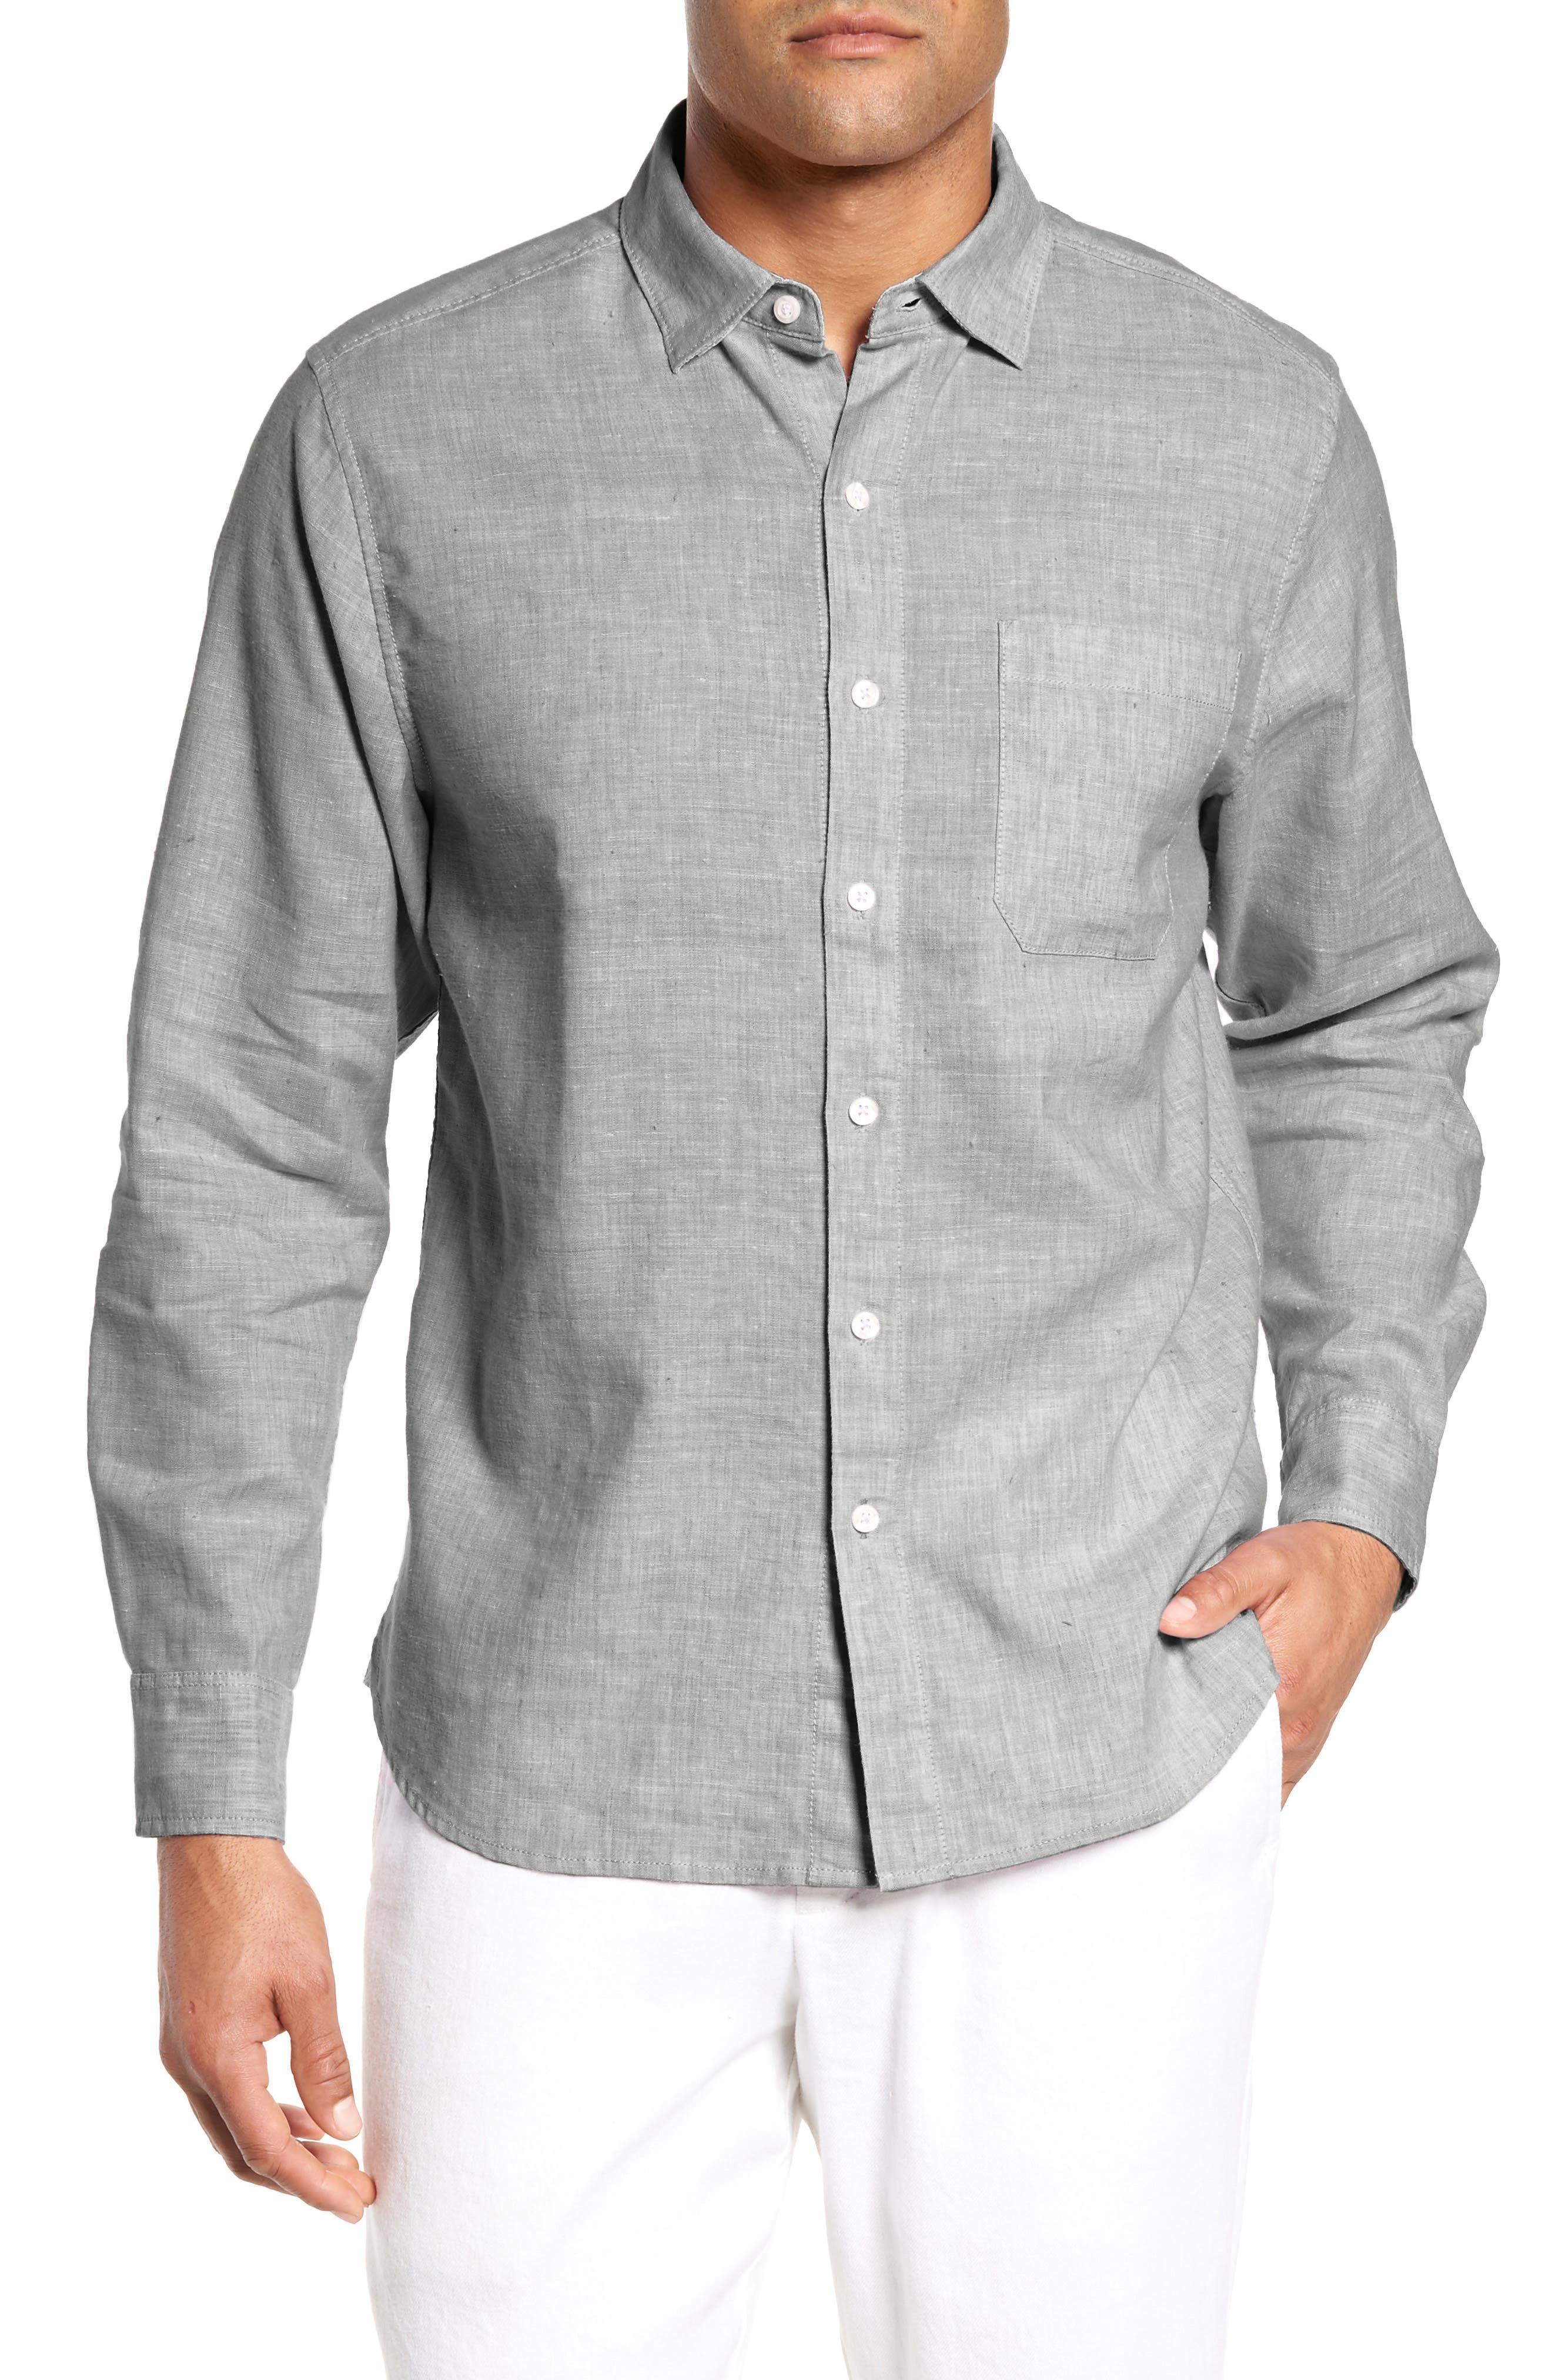 Lanai Tides Regular Fit Linen Blend Sport Shirt,                         Main,                         color, Smoke Grey